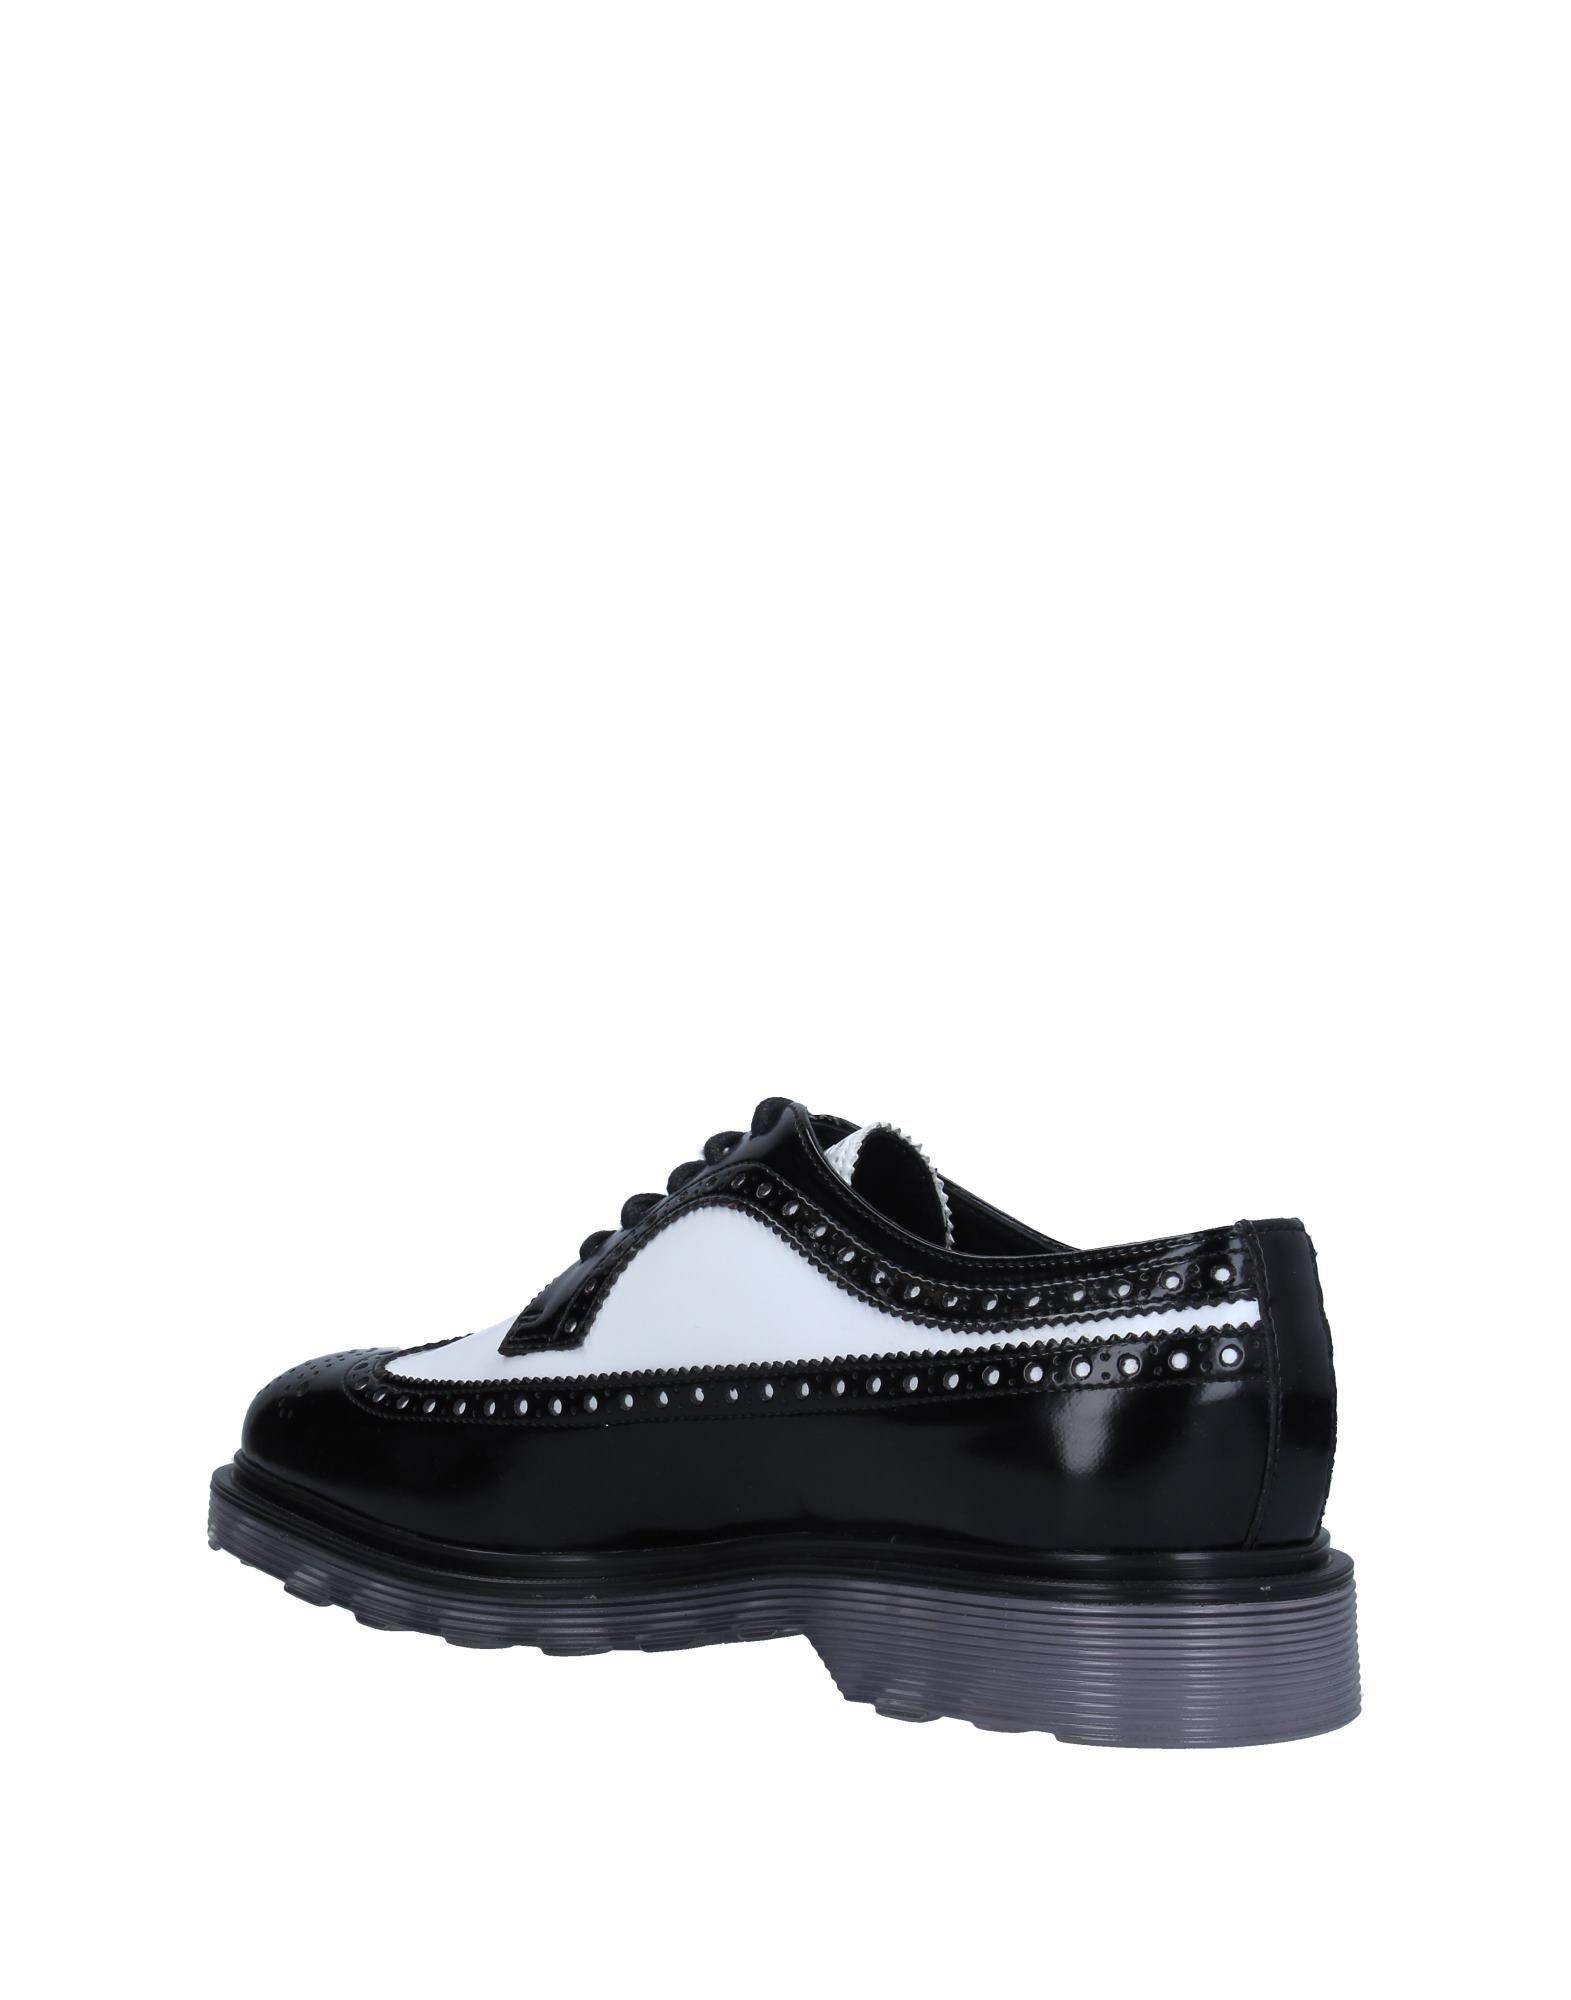 Rabatt echte Schuhe Cult Schnürschuhe  Herren  Schnürschuhe 11298777IH 07b31f